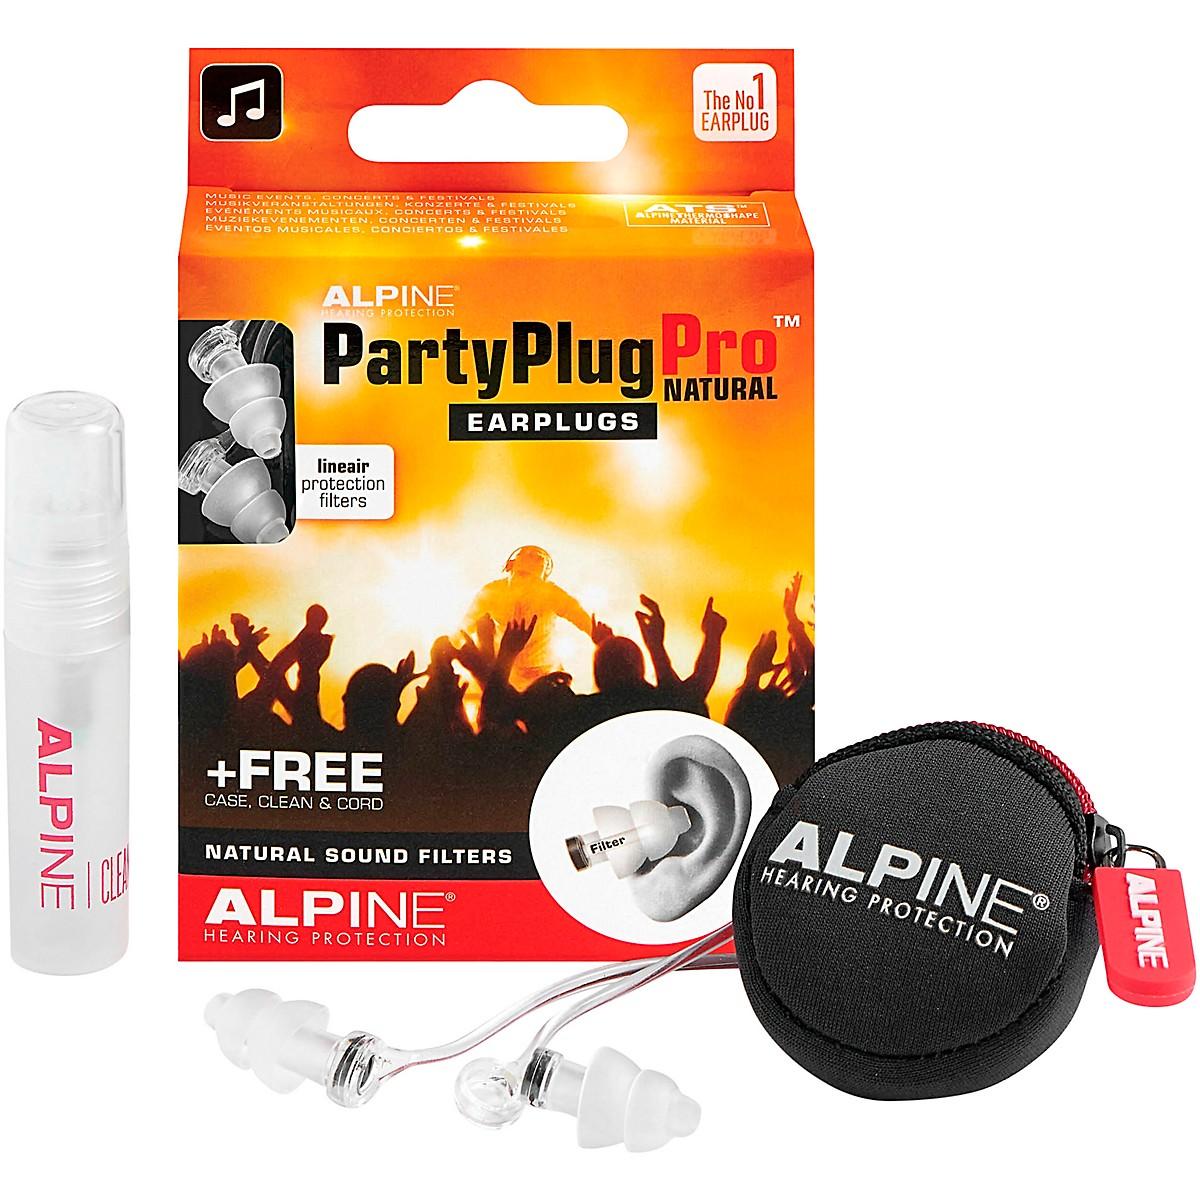 Alpine Hearing Protection PartyPlug Pro Natural Earplugs